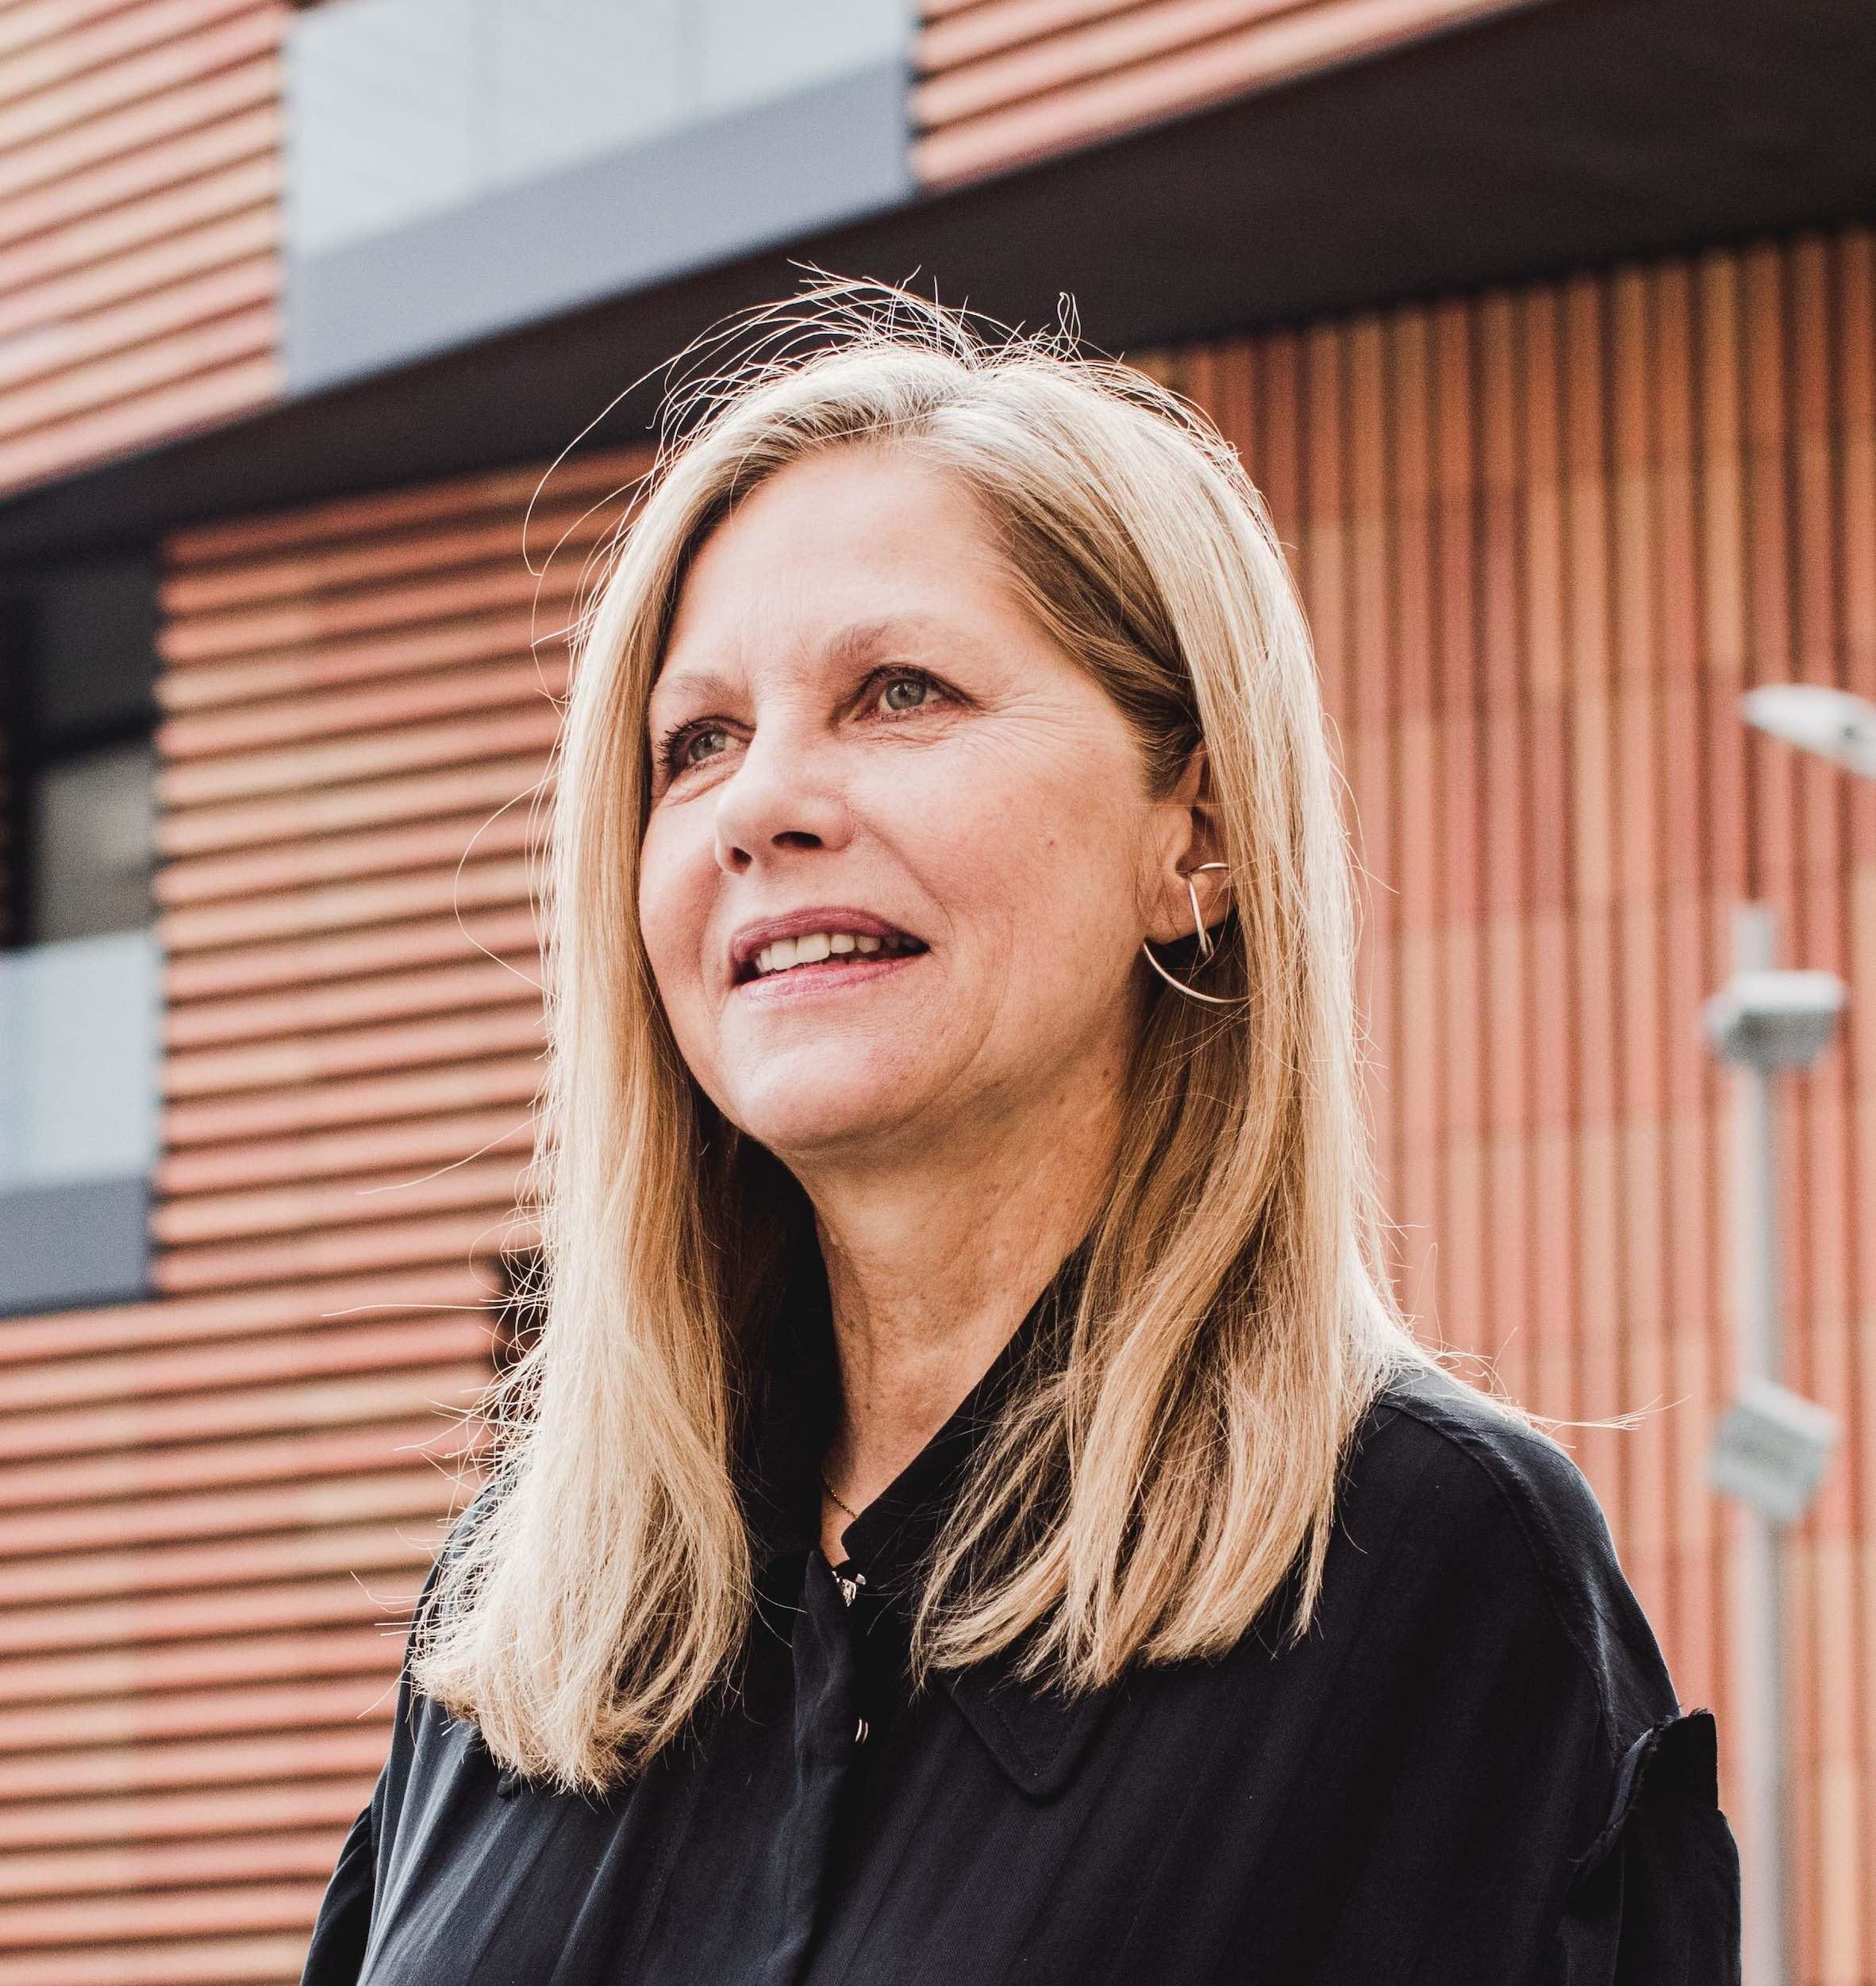 Martha Thorne is a speaker at Business of Design Week